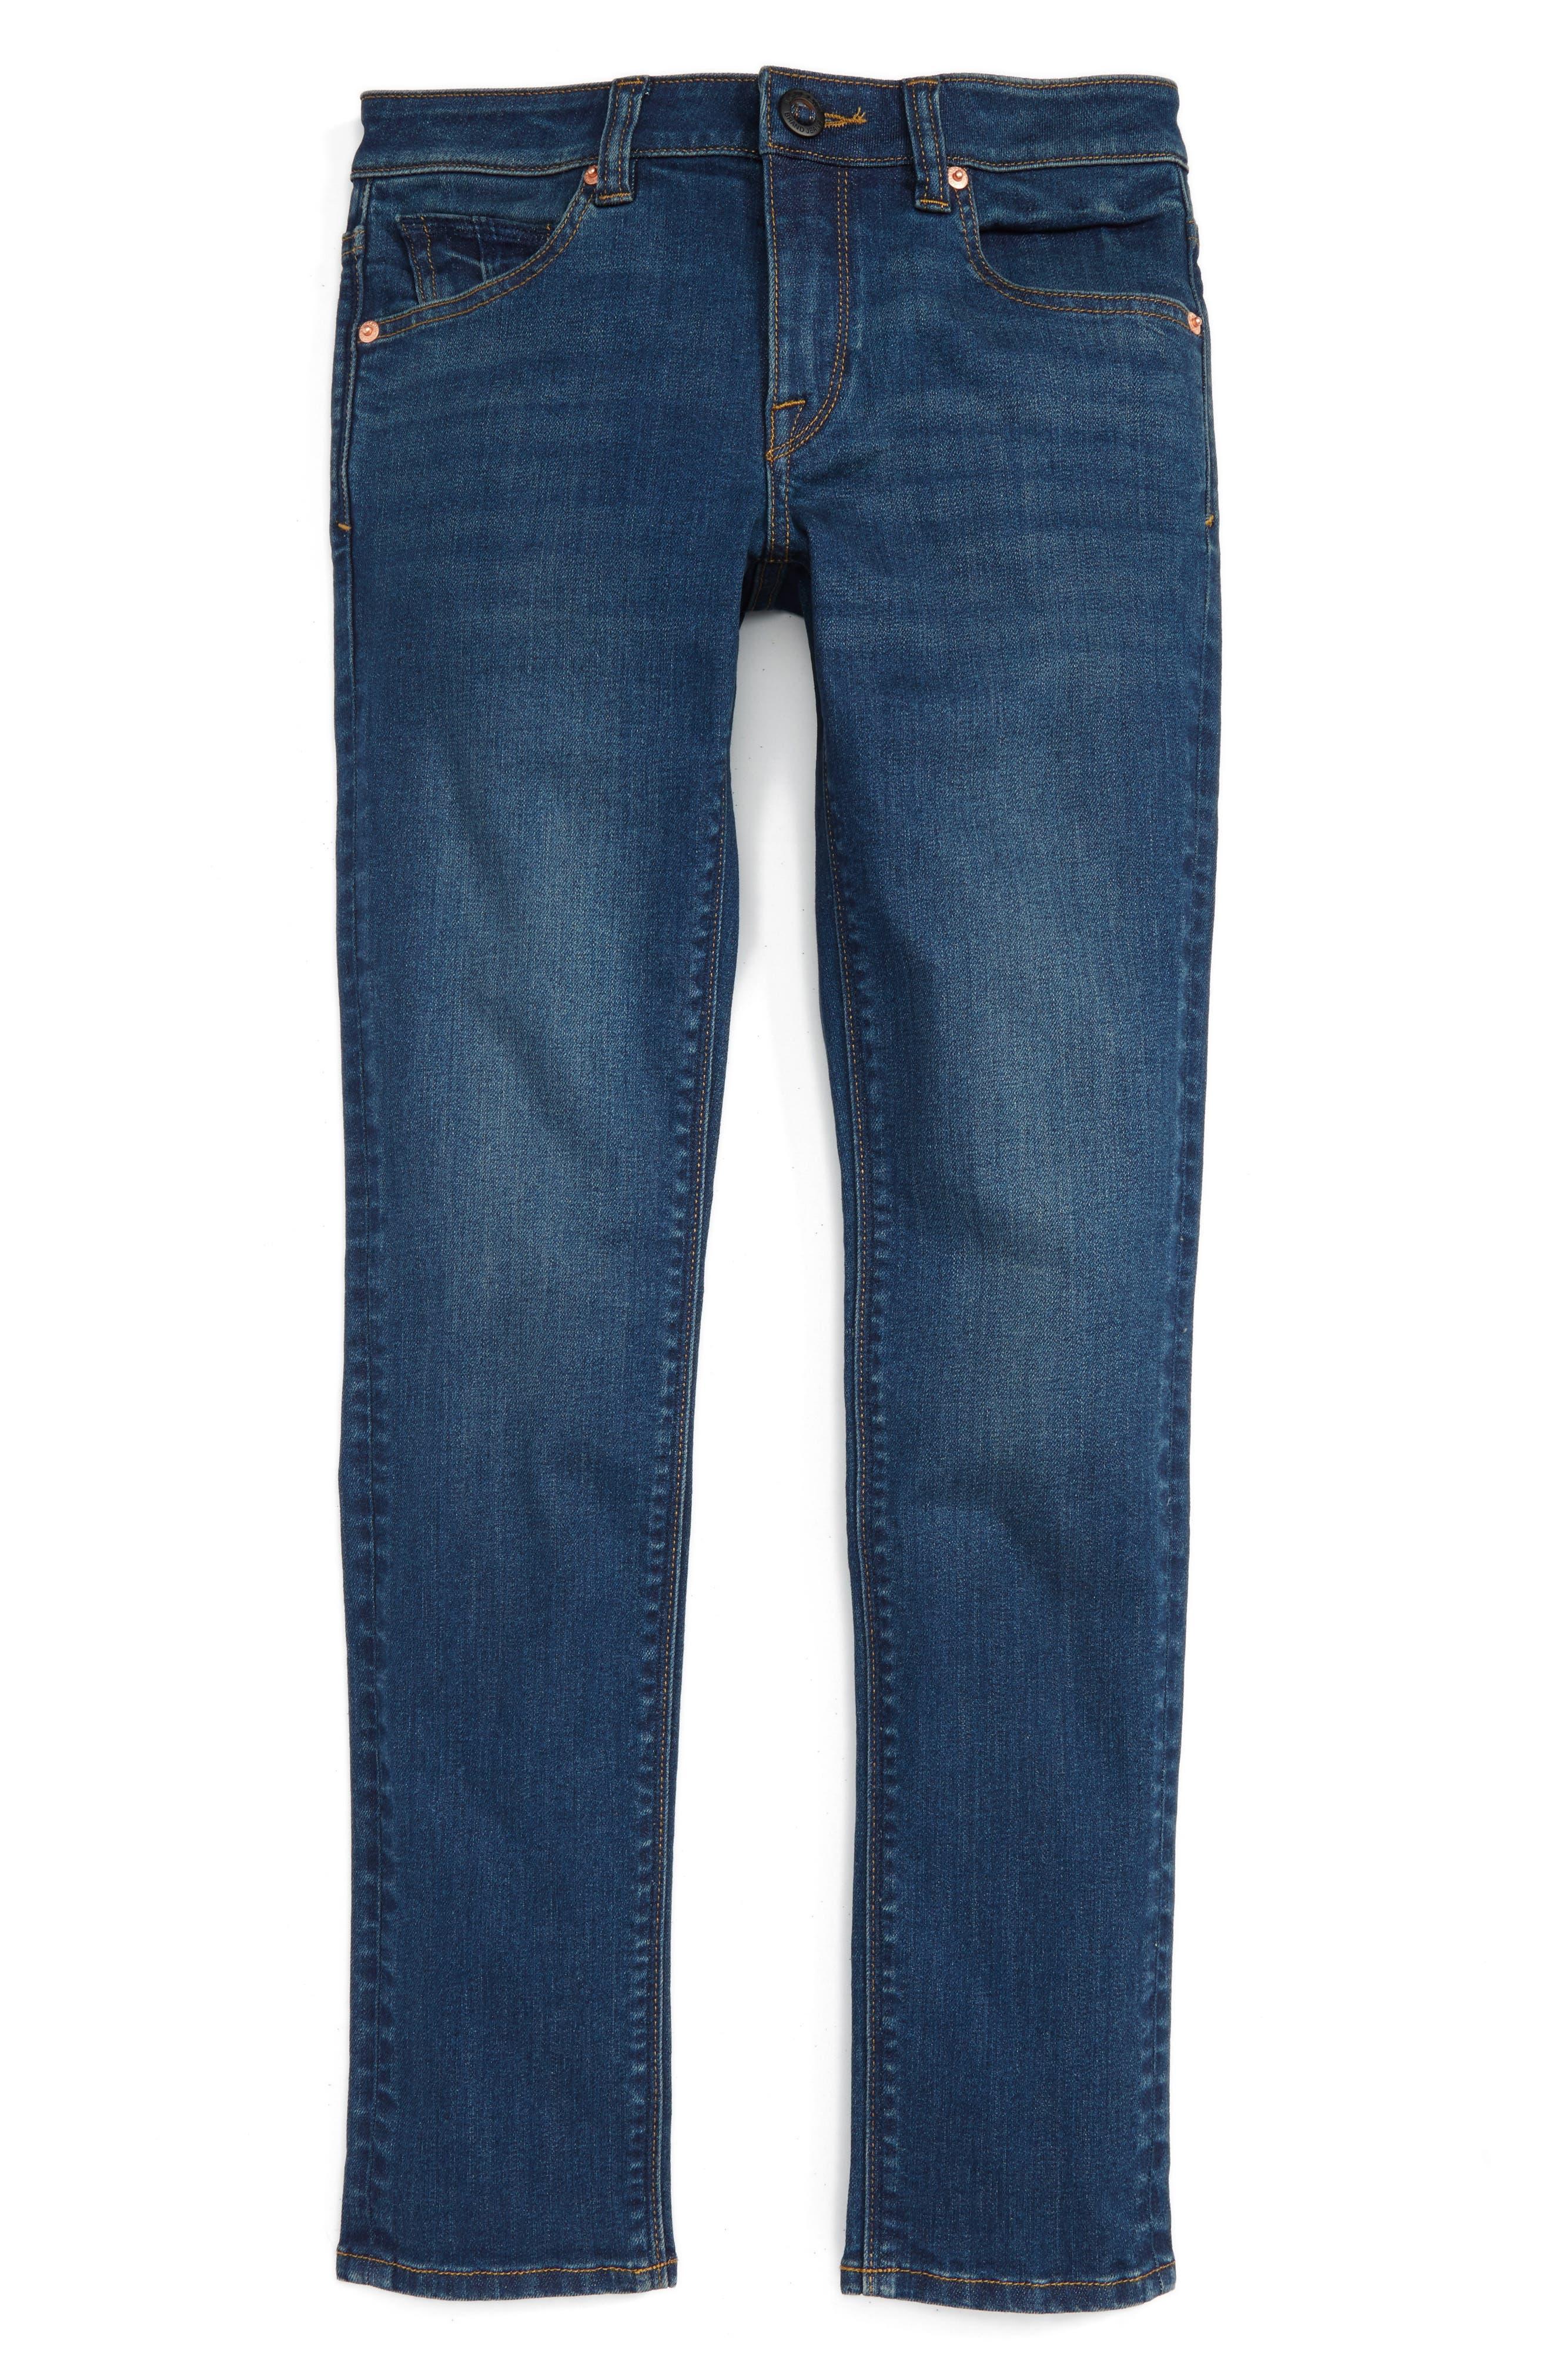 'Solver' Straight Leg Denim Jeans,                         Main,                         color, DUST BOWL INDIGO